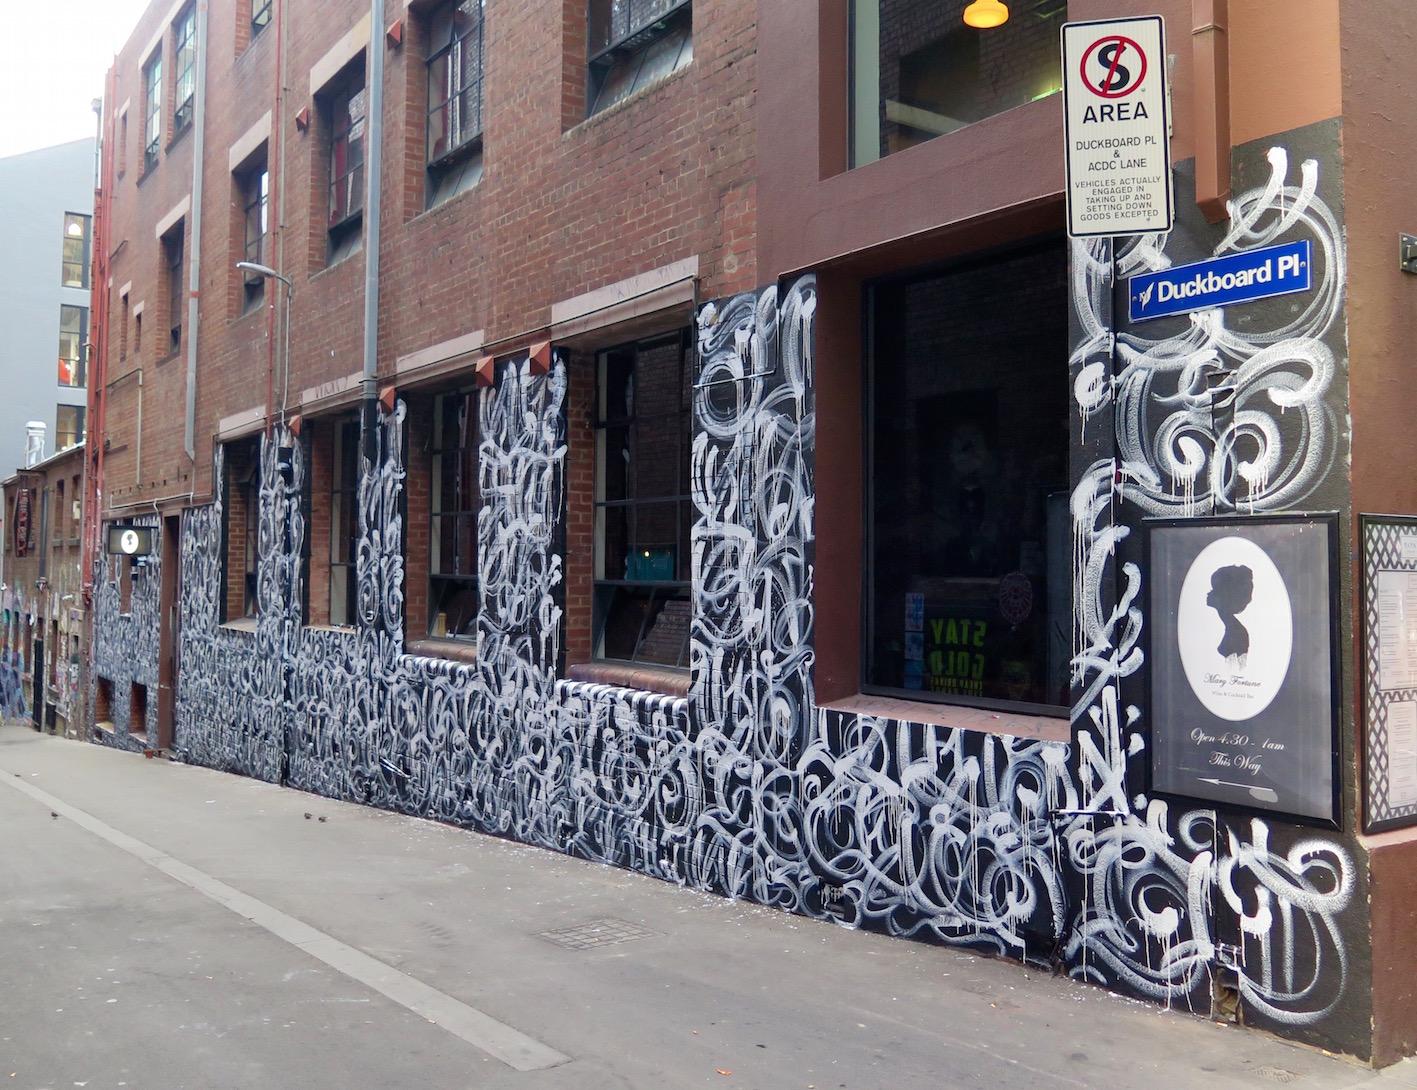 deansunshine_landofsunshine_melbourne_streetart_graffiti_invurt top ten 57 5 Mayo 5